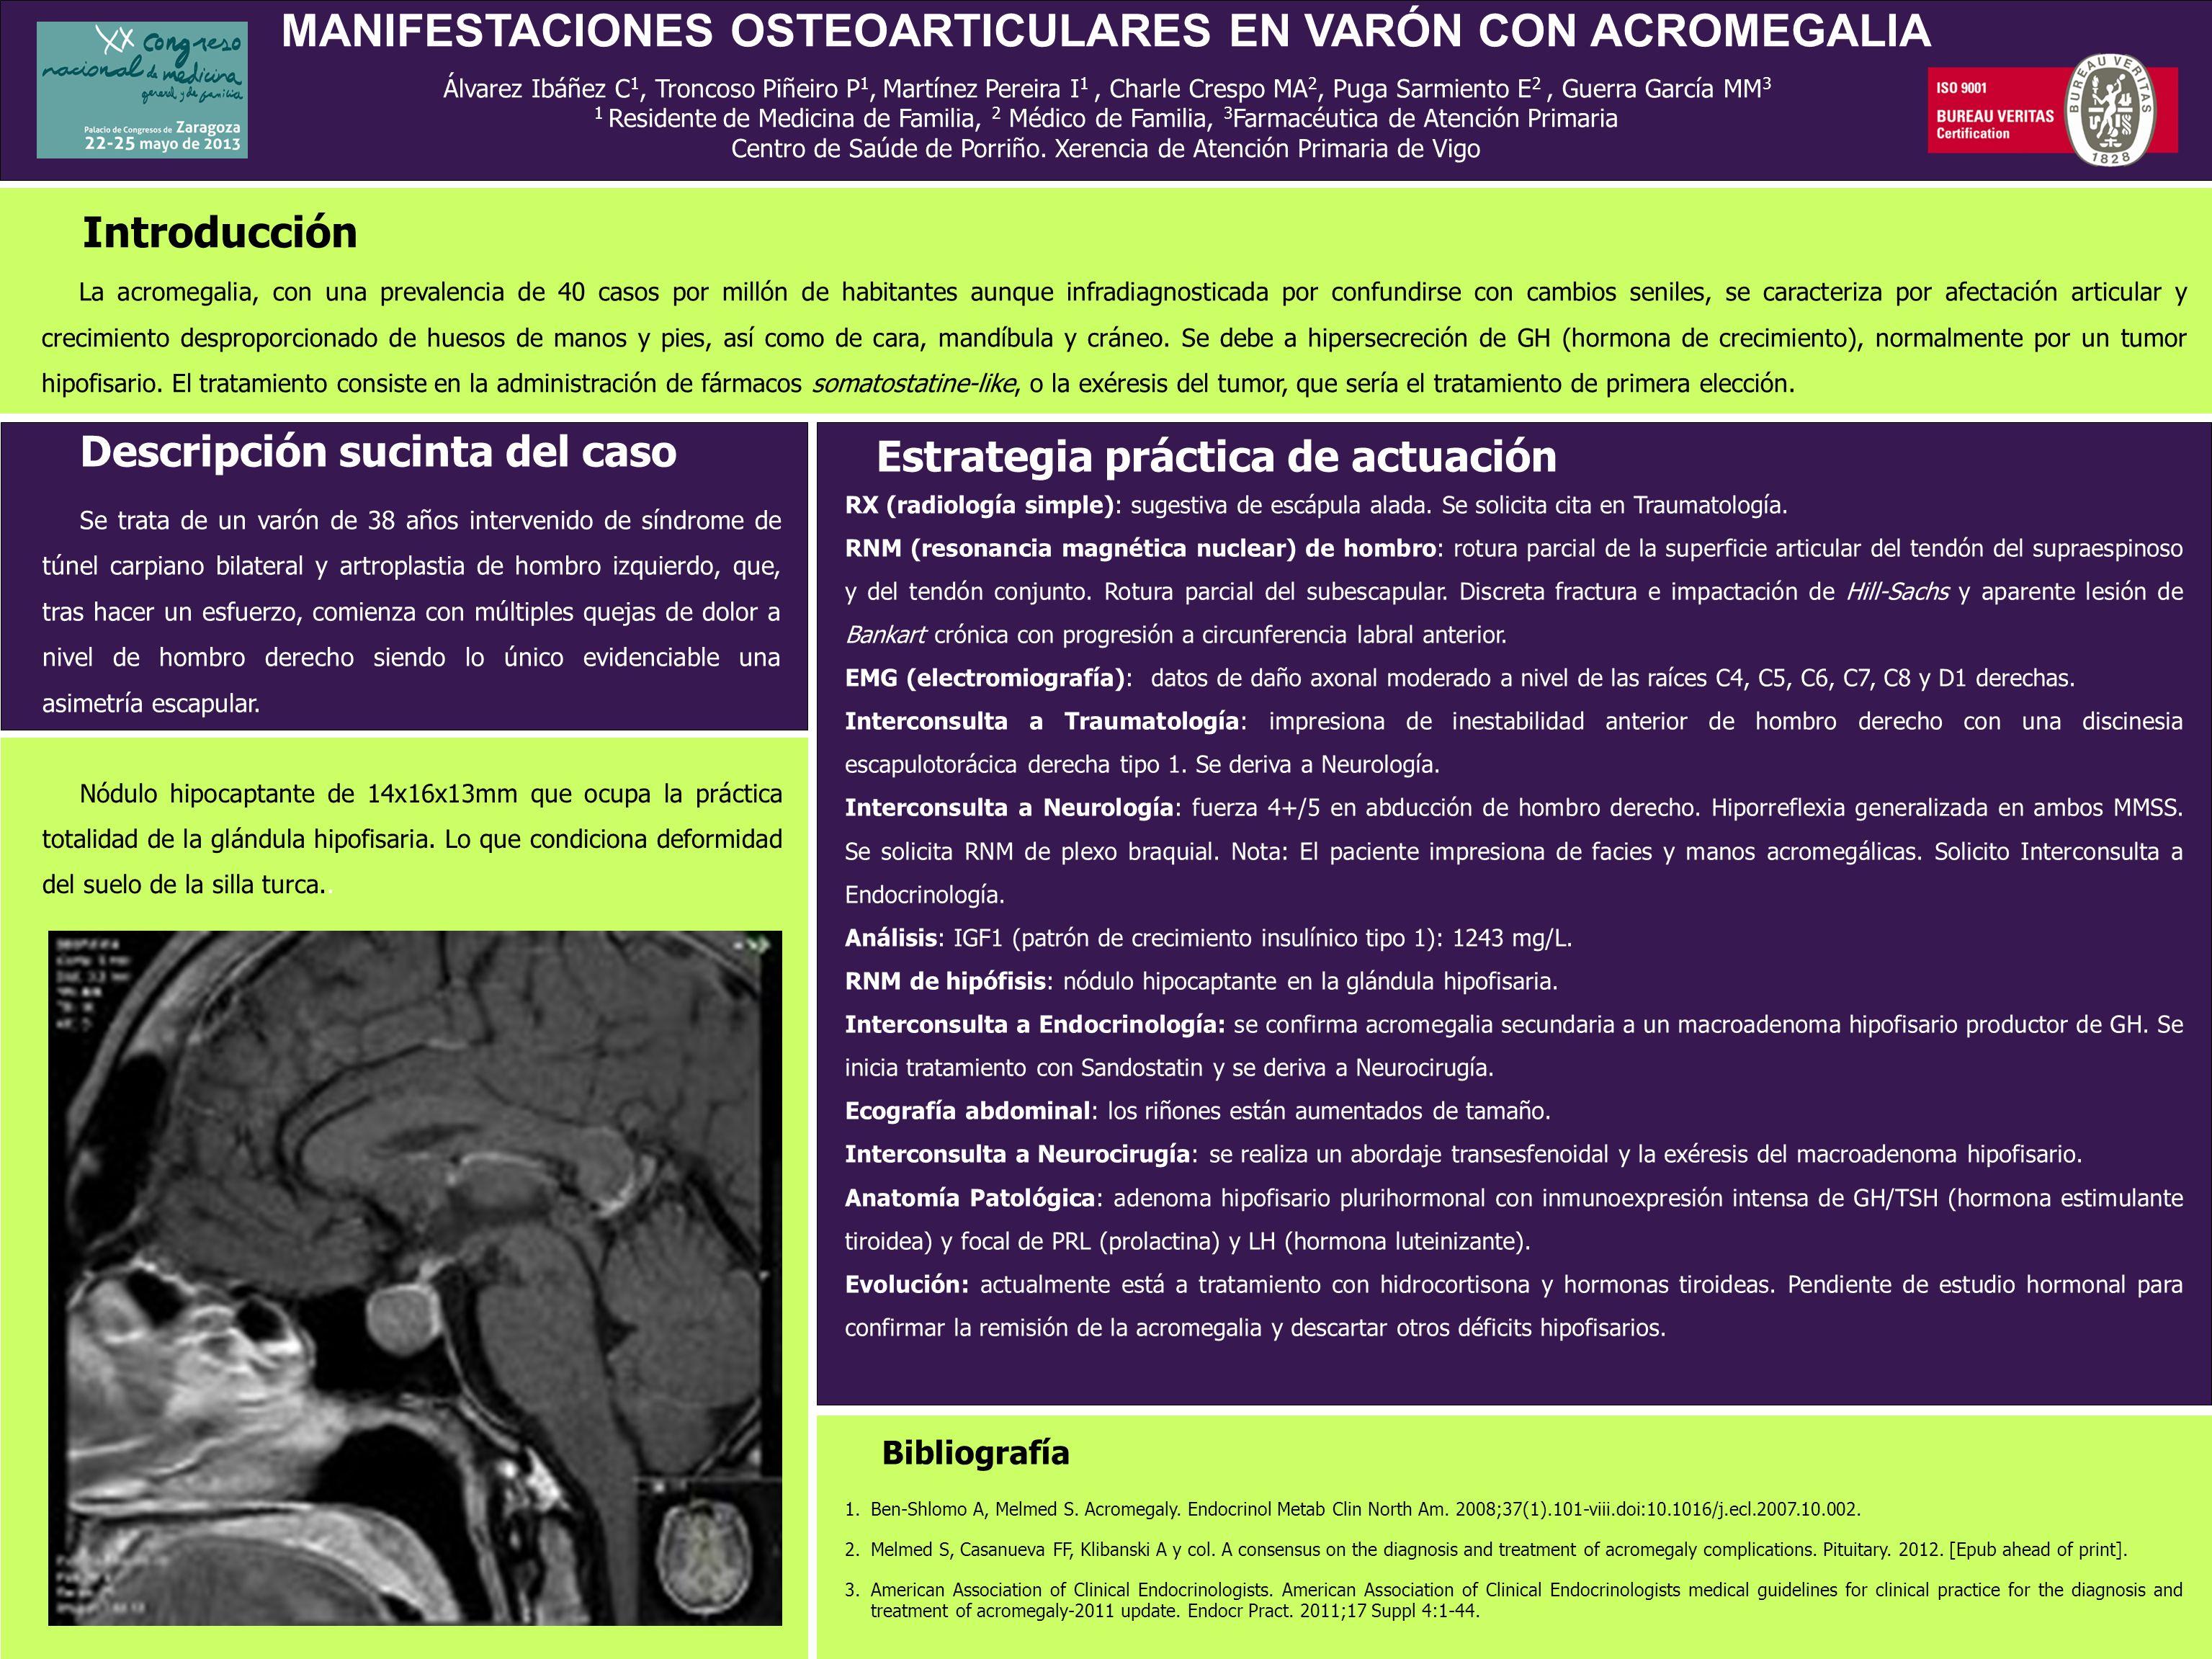 MANIFESTACIONES OSTEOARTICULARES EN VARÓN CON ACROMEGALIA Álvarez Ibáñez C 1, Troncoso Piñeiro P 1, Martínez Pereira I 1, Charle Crespo MA 2, Puga Sar